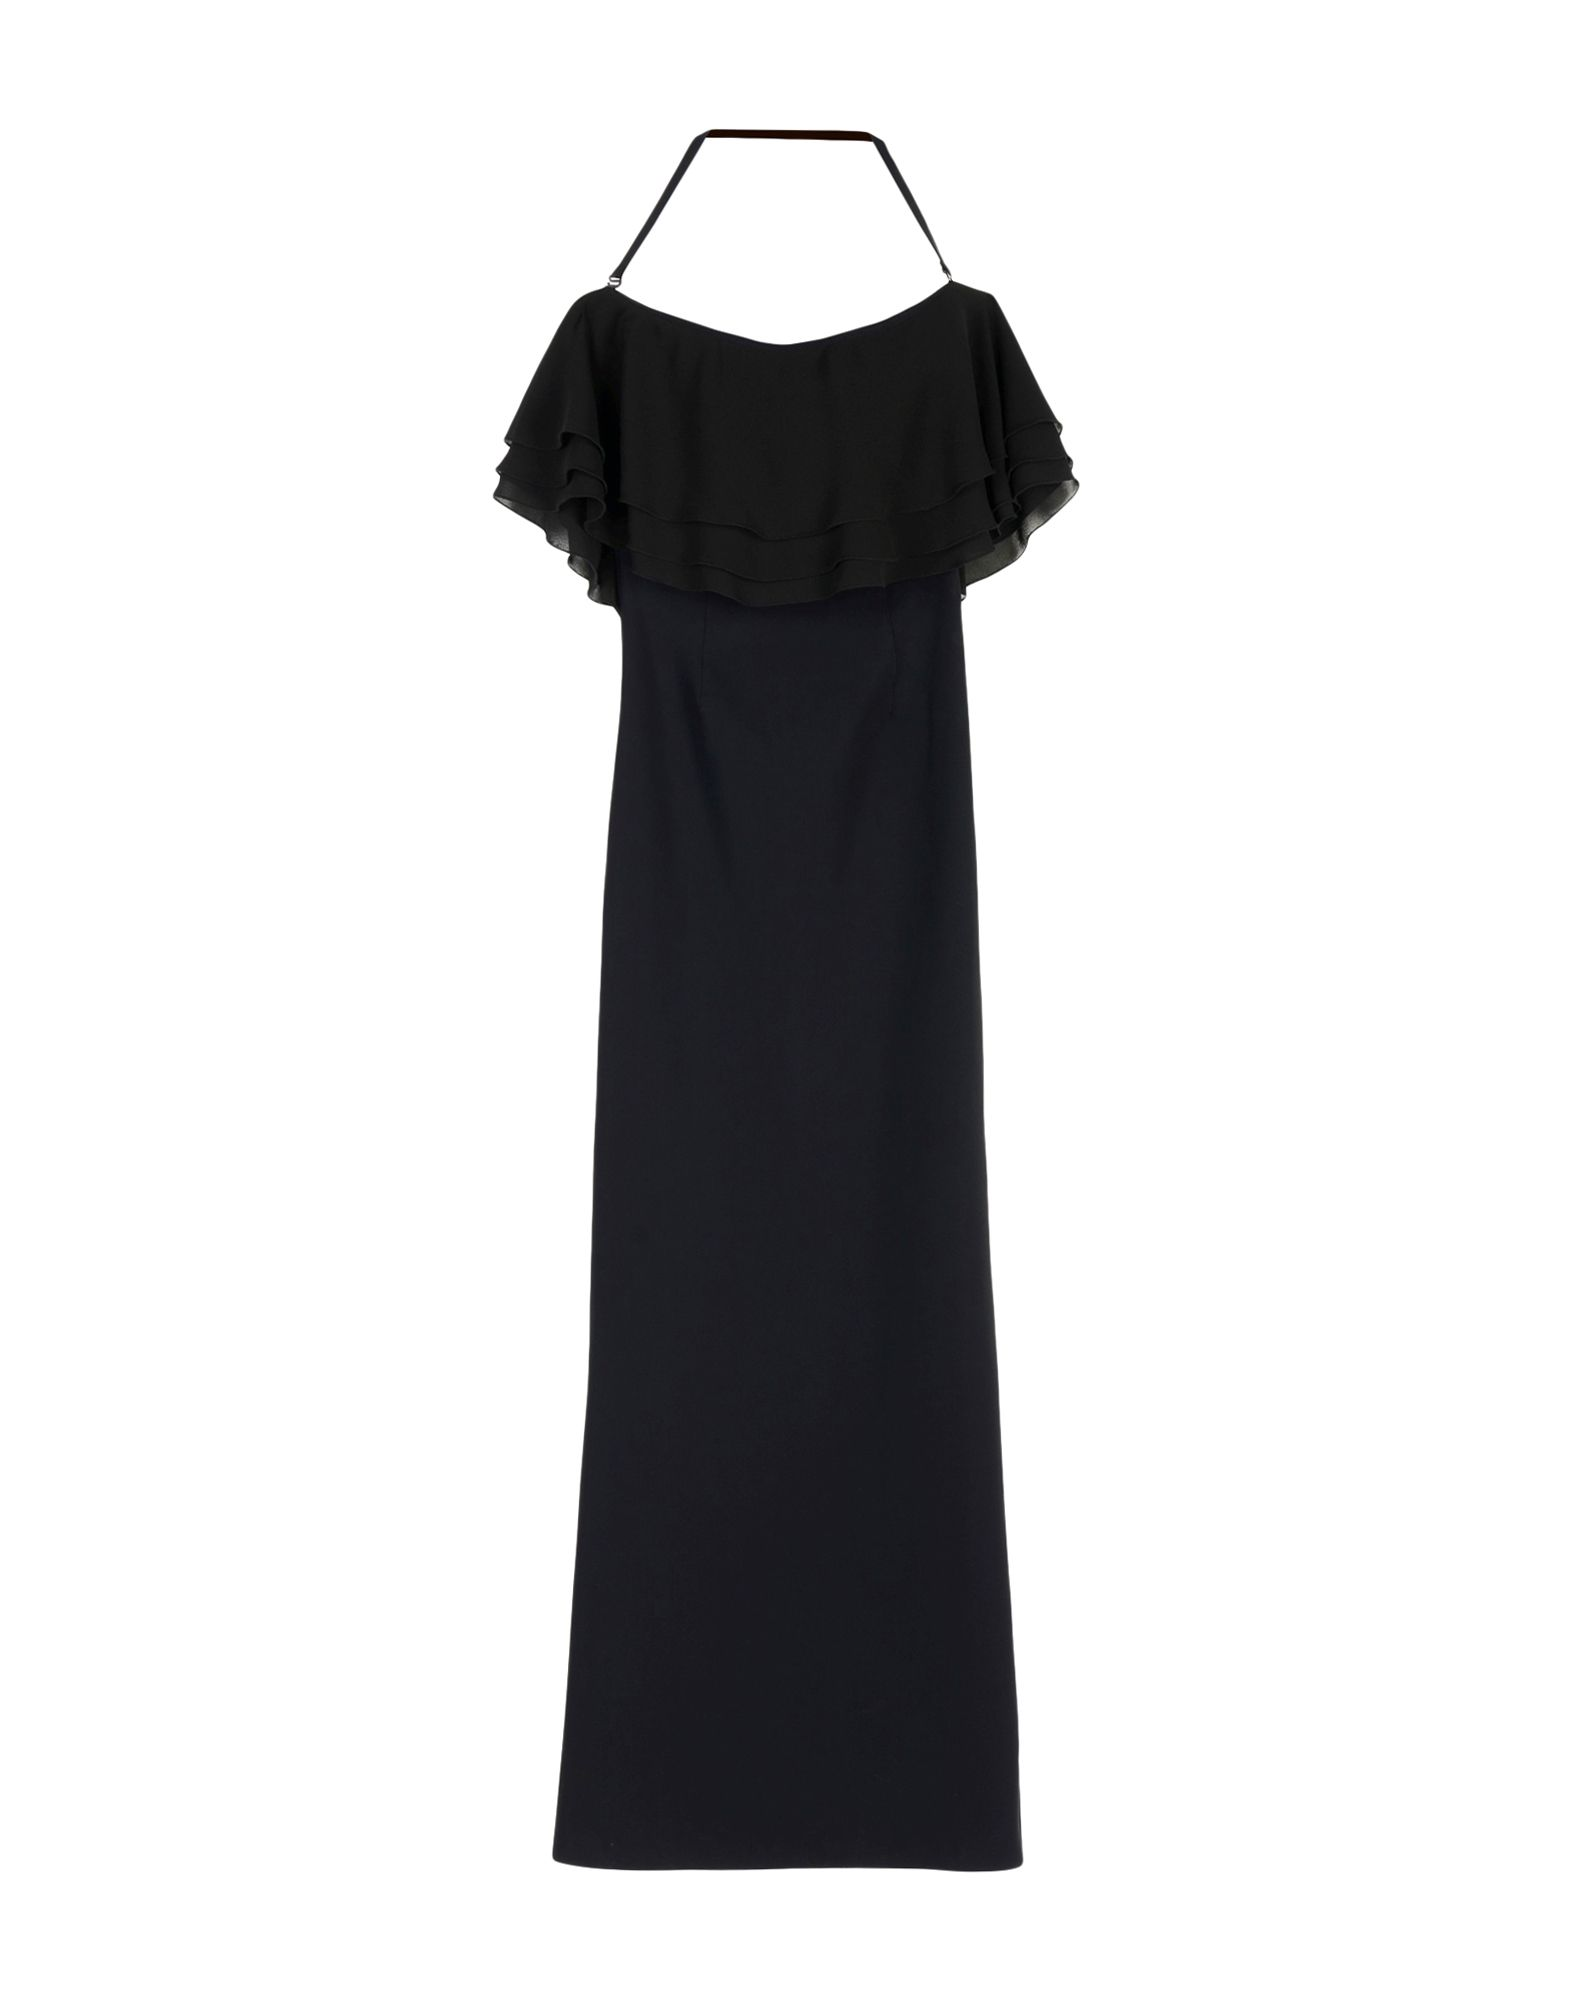 CHRISTIES À PORTER Длинное платье